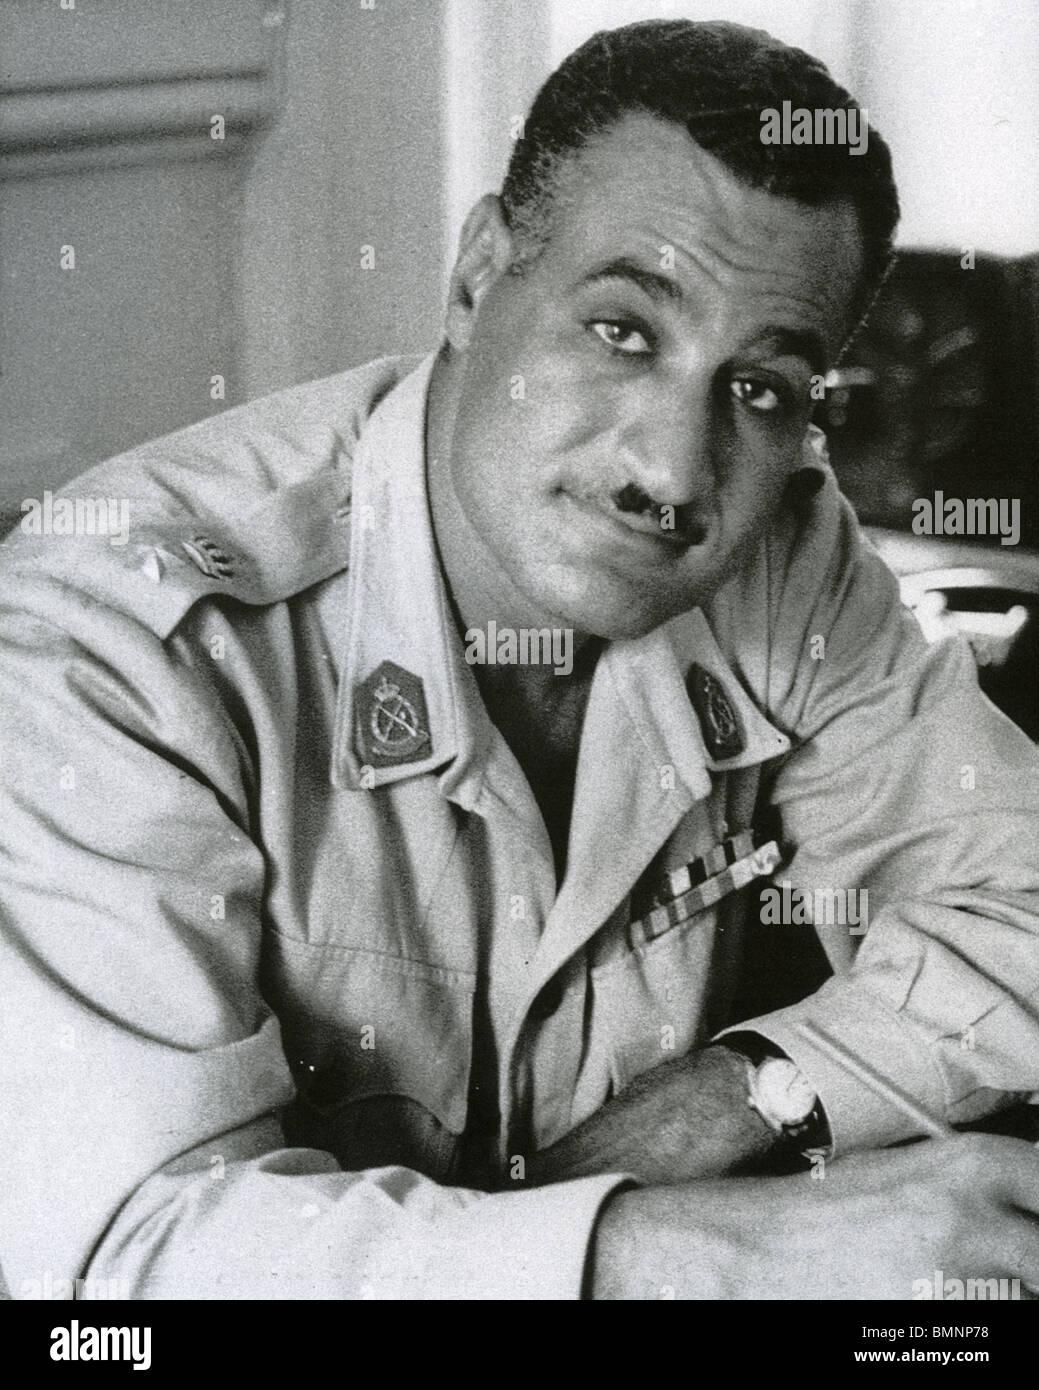 GAMAL ABDEL NASSER (1918-1970) was the second President of Egypt - Stock Image